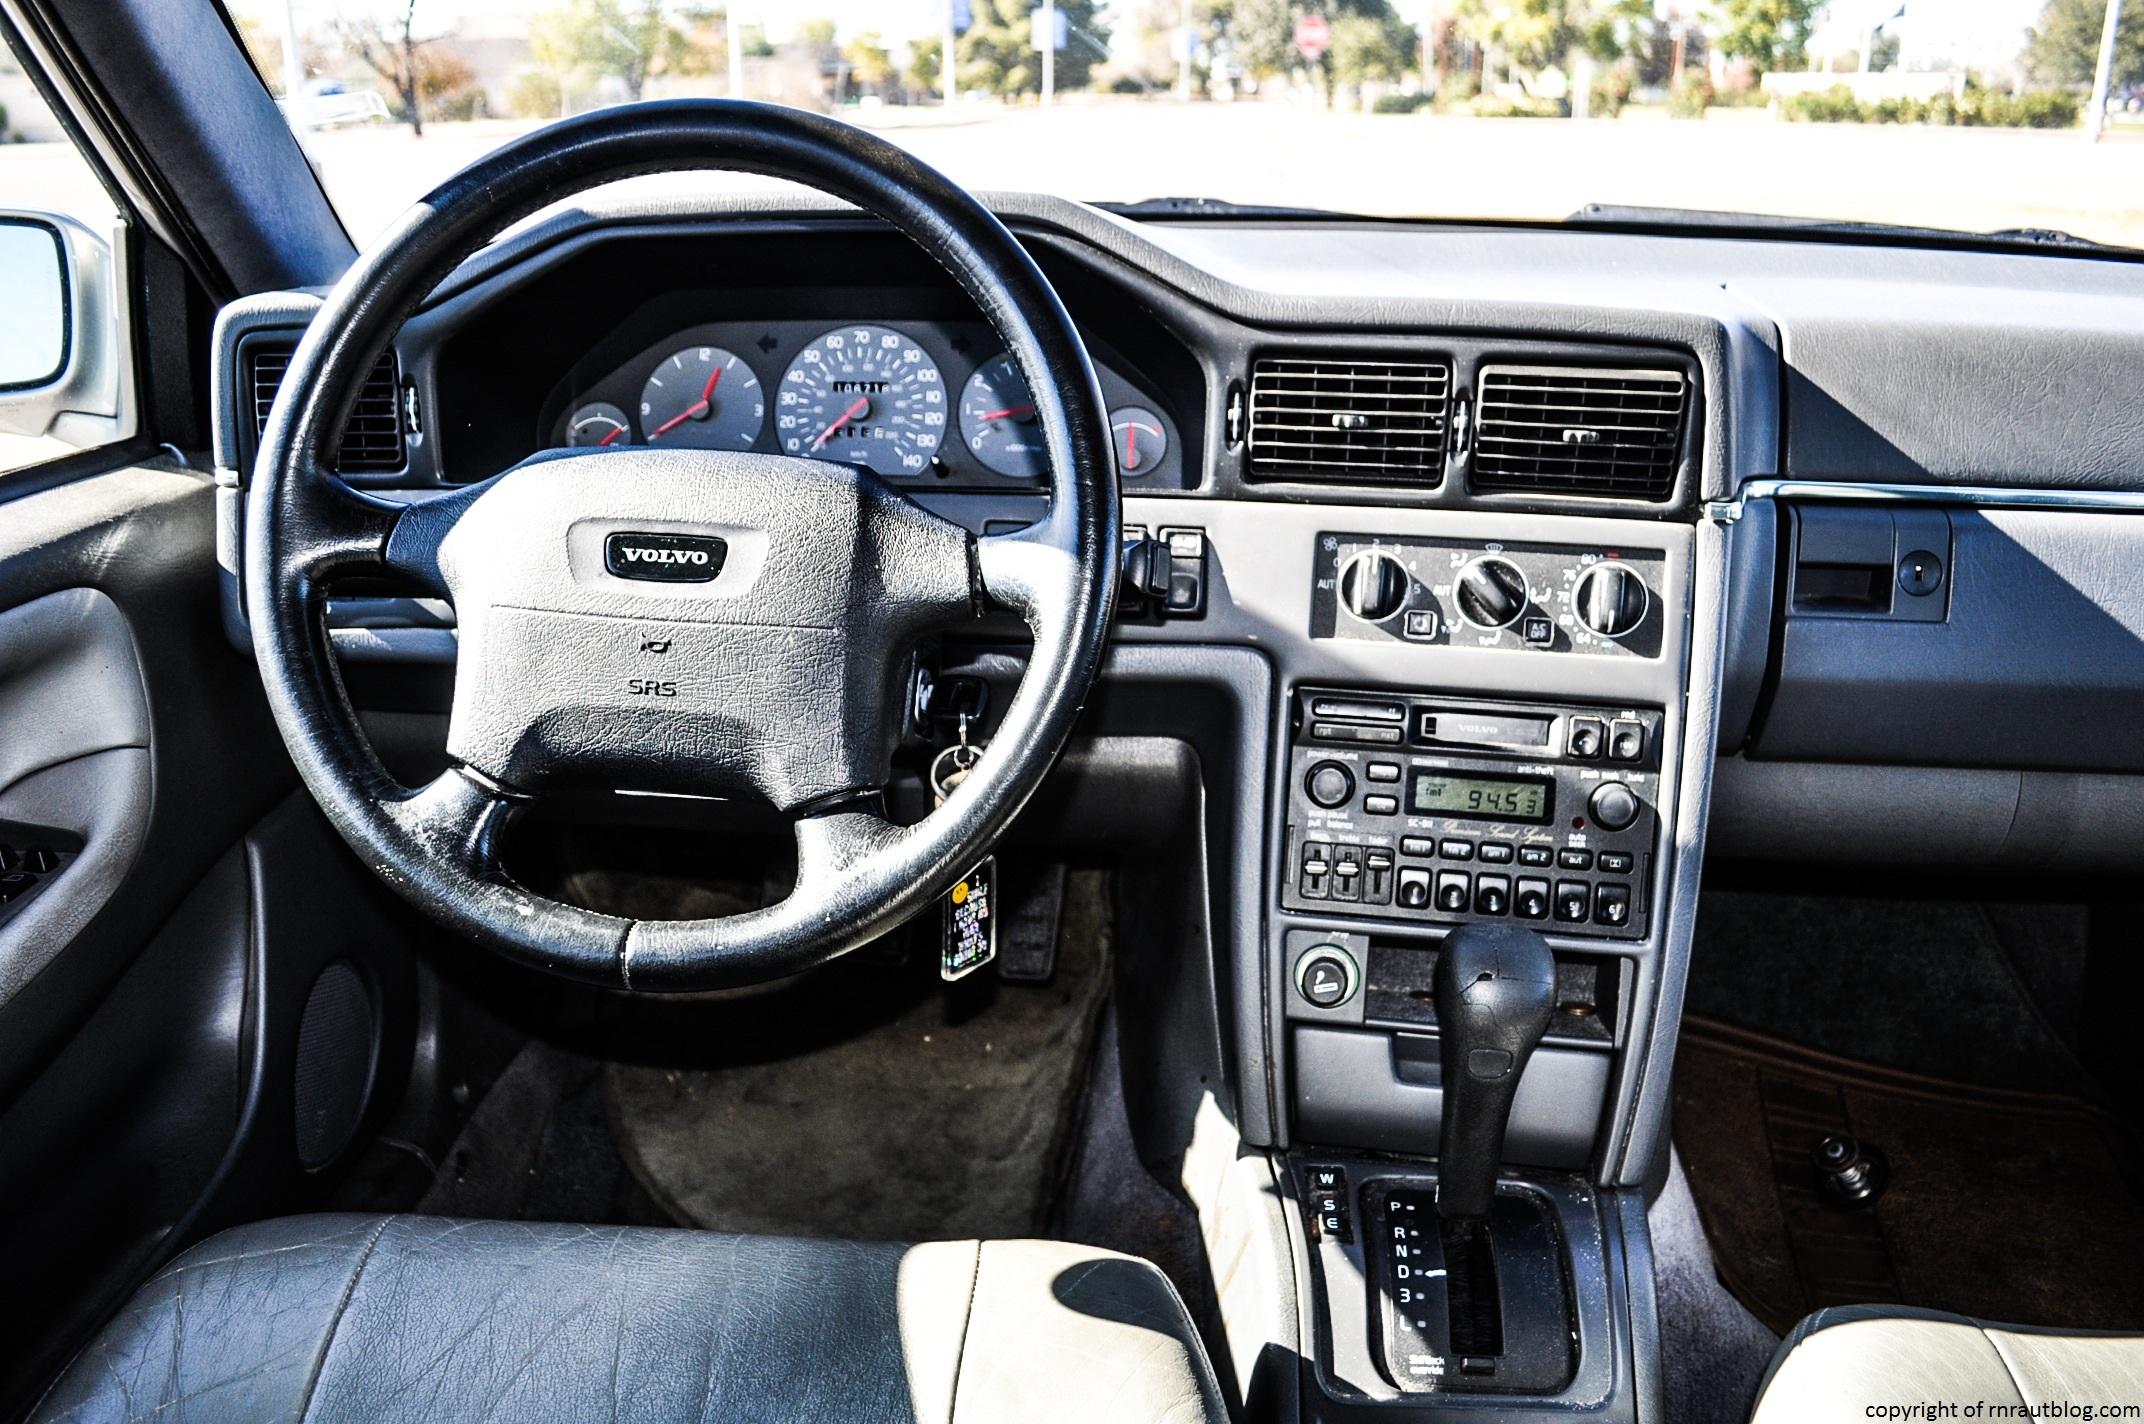 Volvo Interior on 1995 Volvo 960